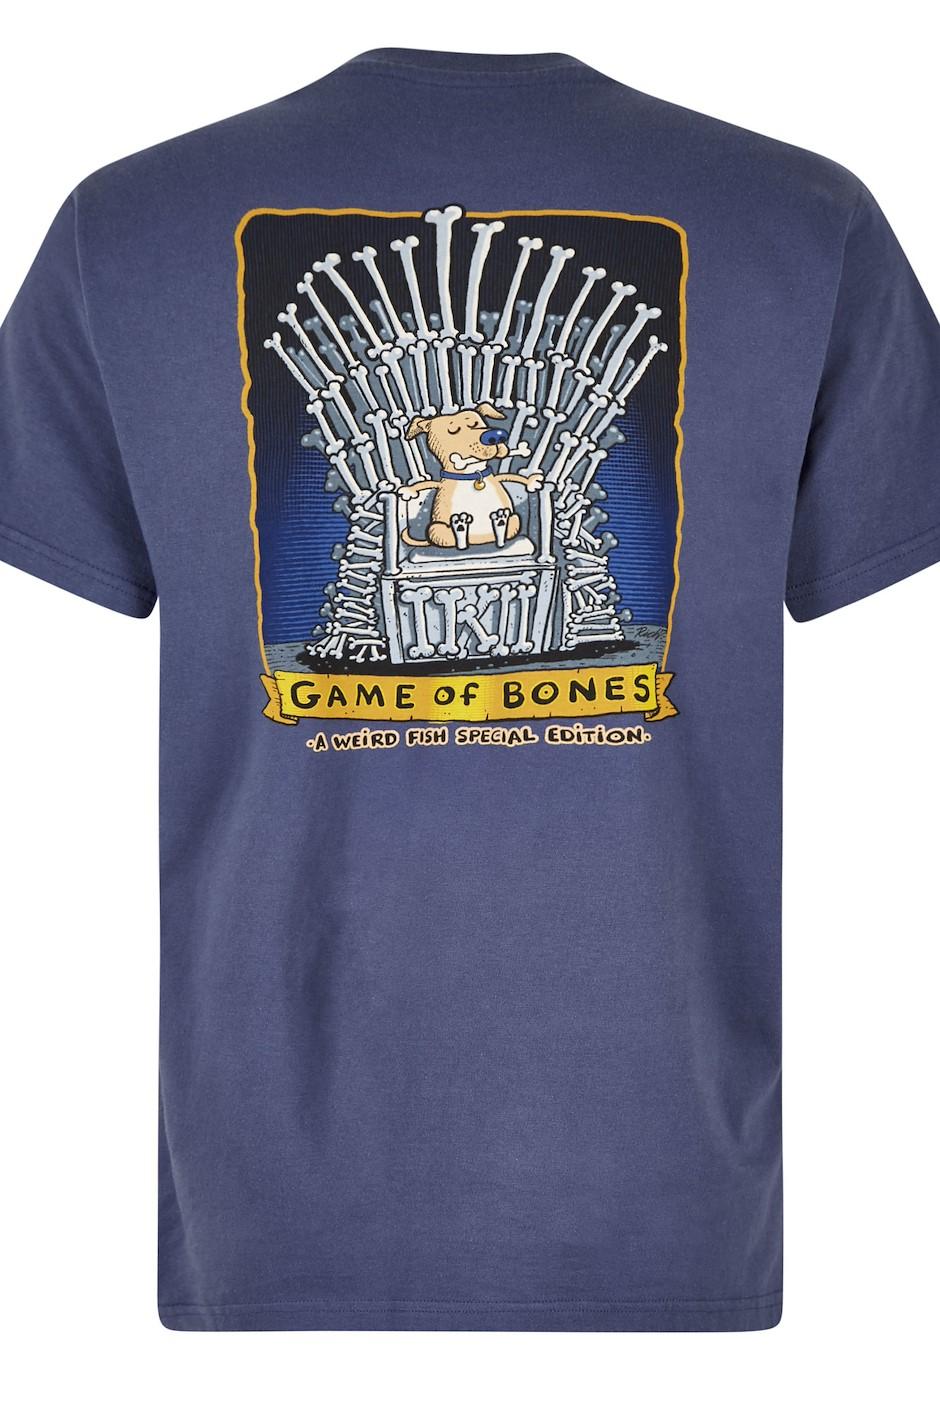 Game Of Bones Artist T-Shirt Blue Indigo